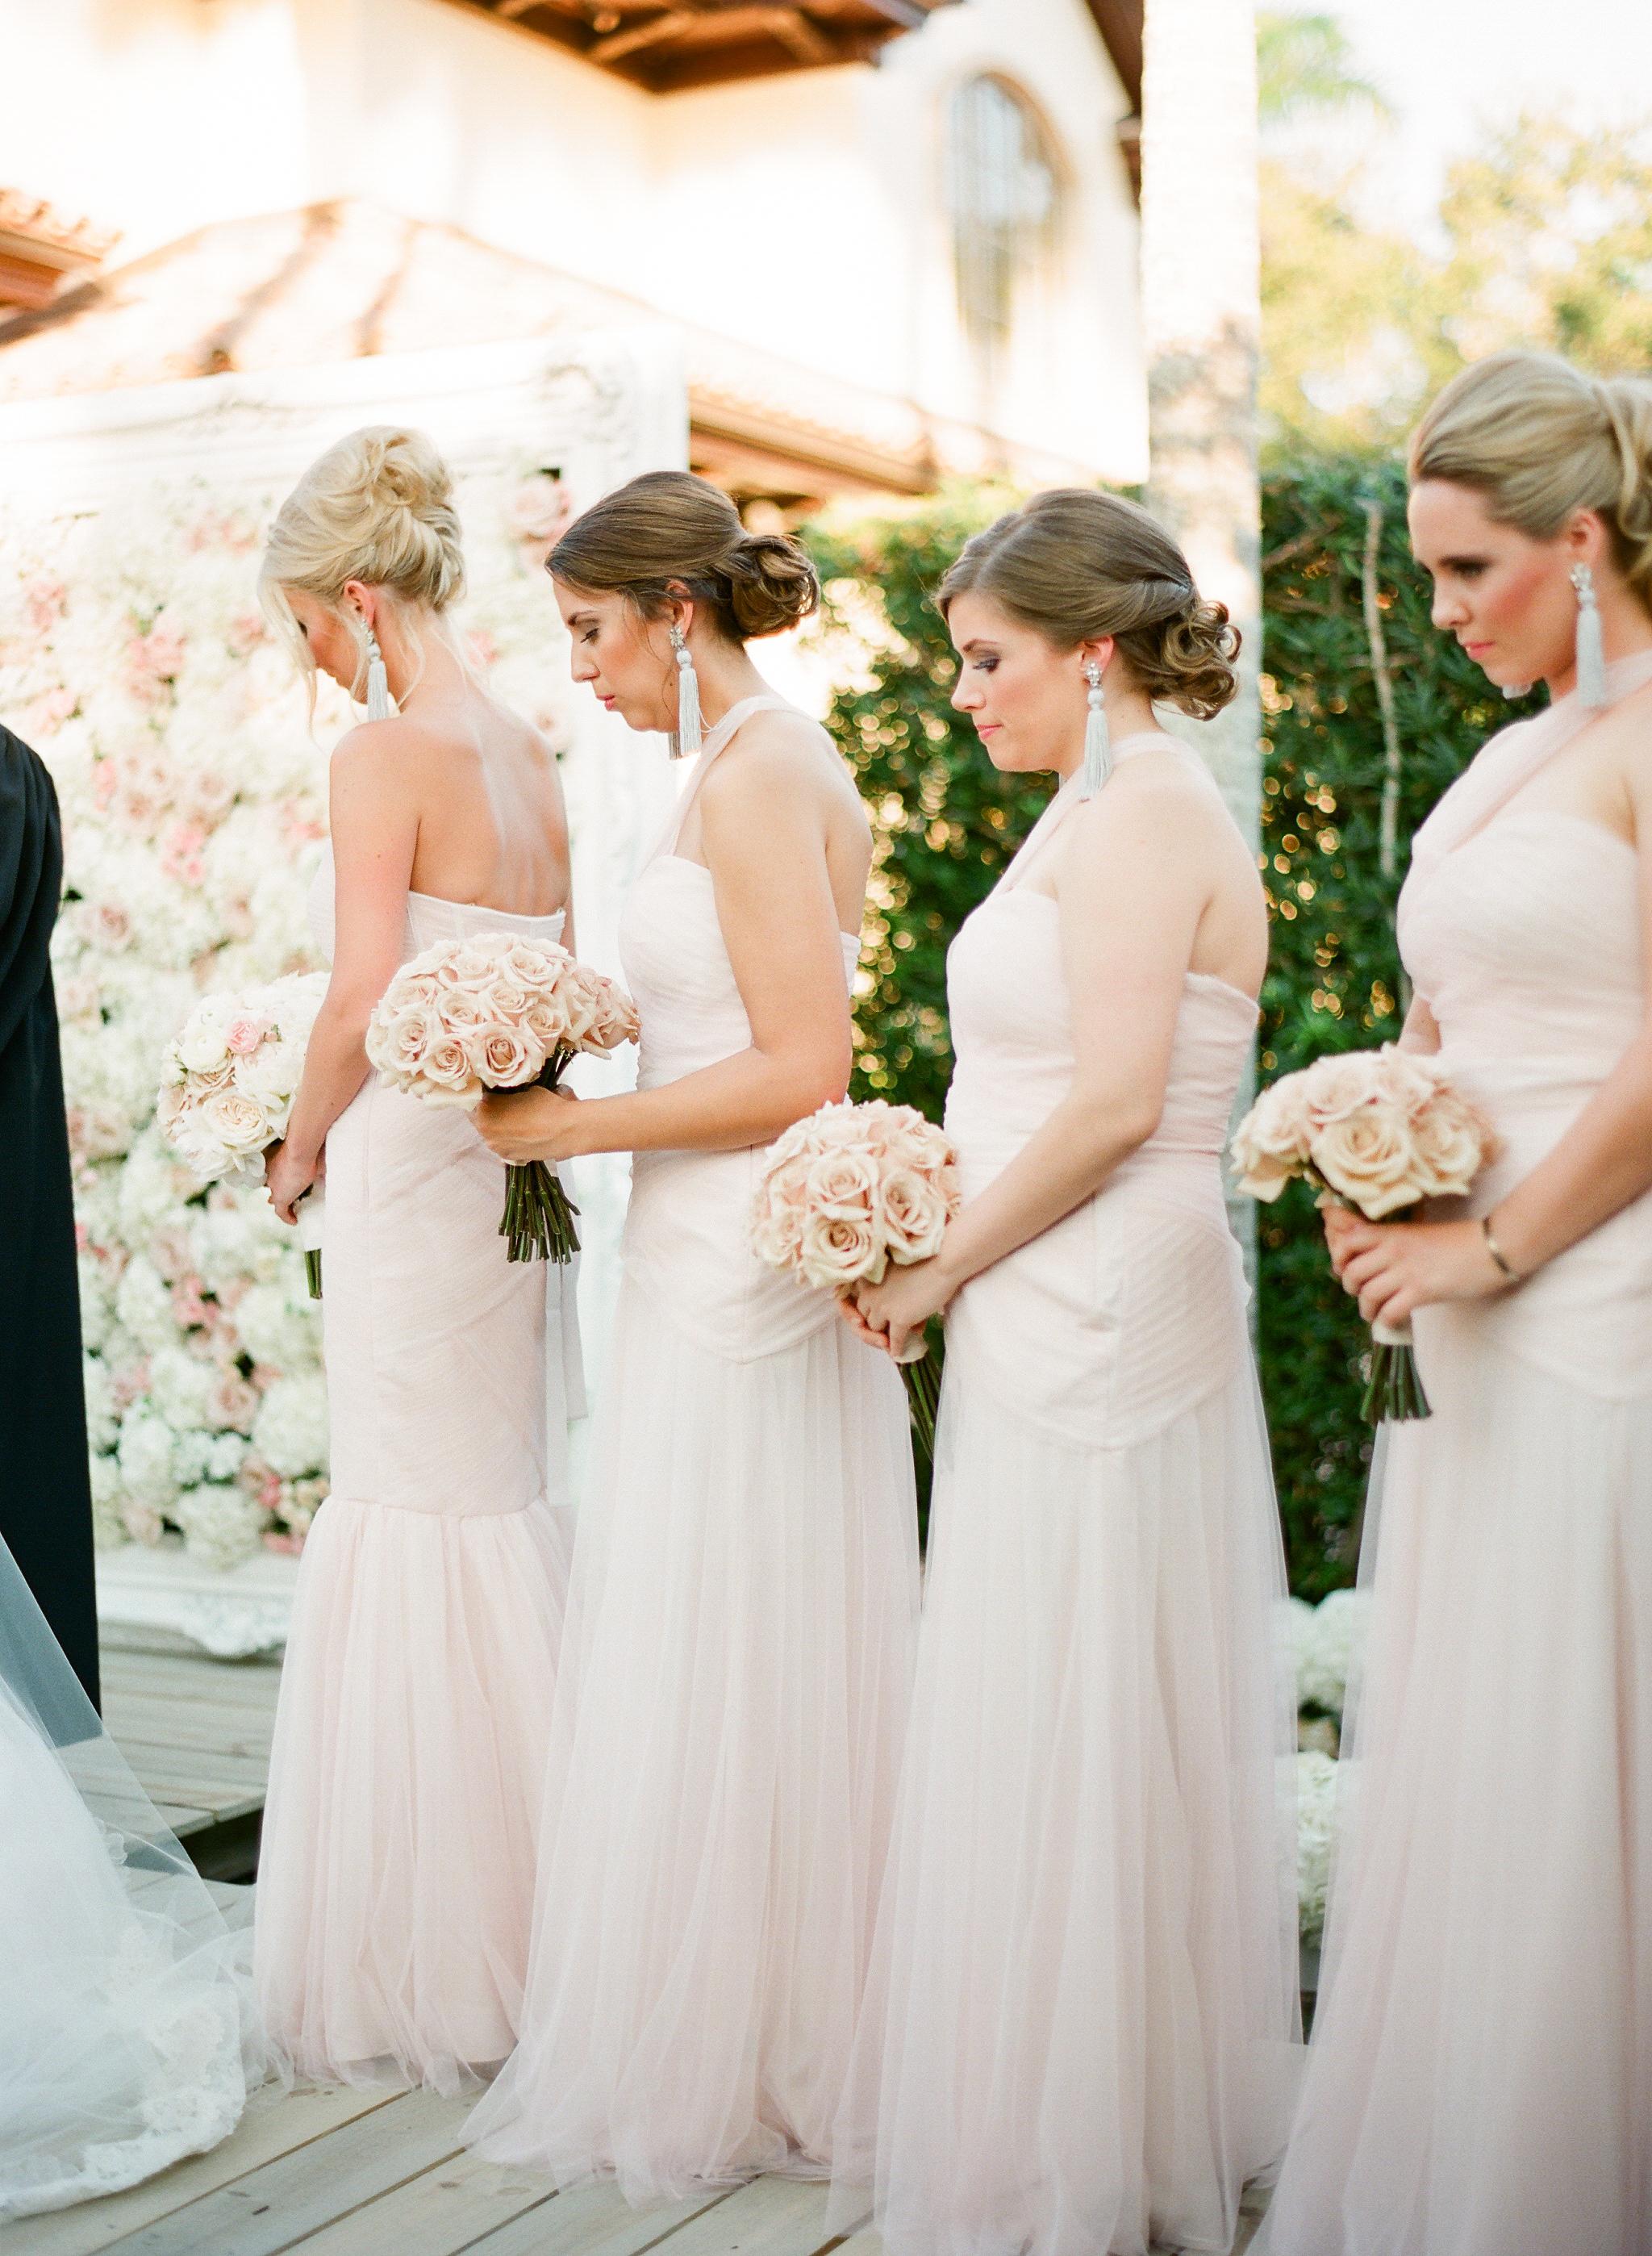 Ceci_New_York_Florida_Wedding_Style_Bride_Watercolor_Real_Custom_Luxury_74.jpg